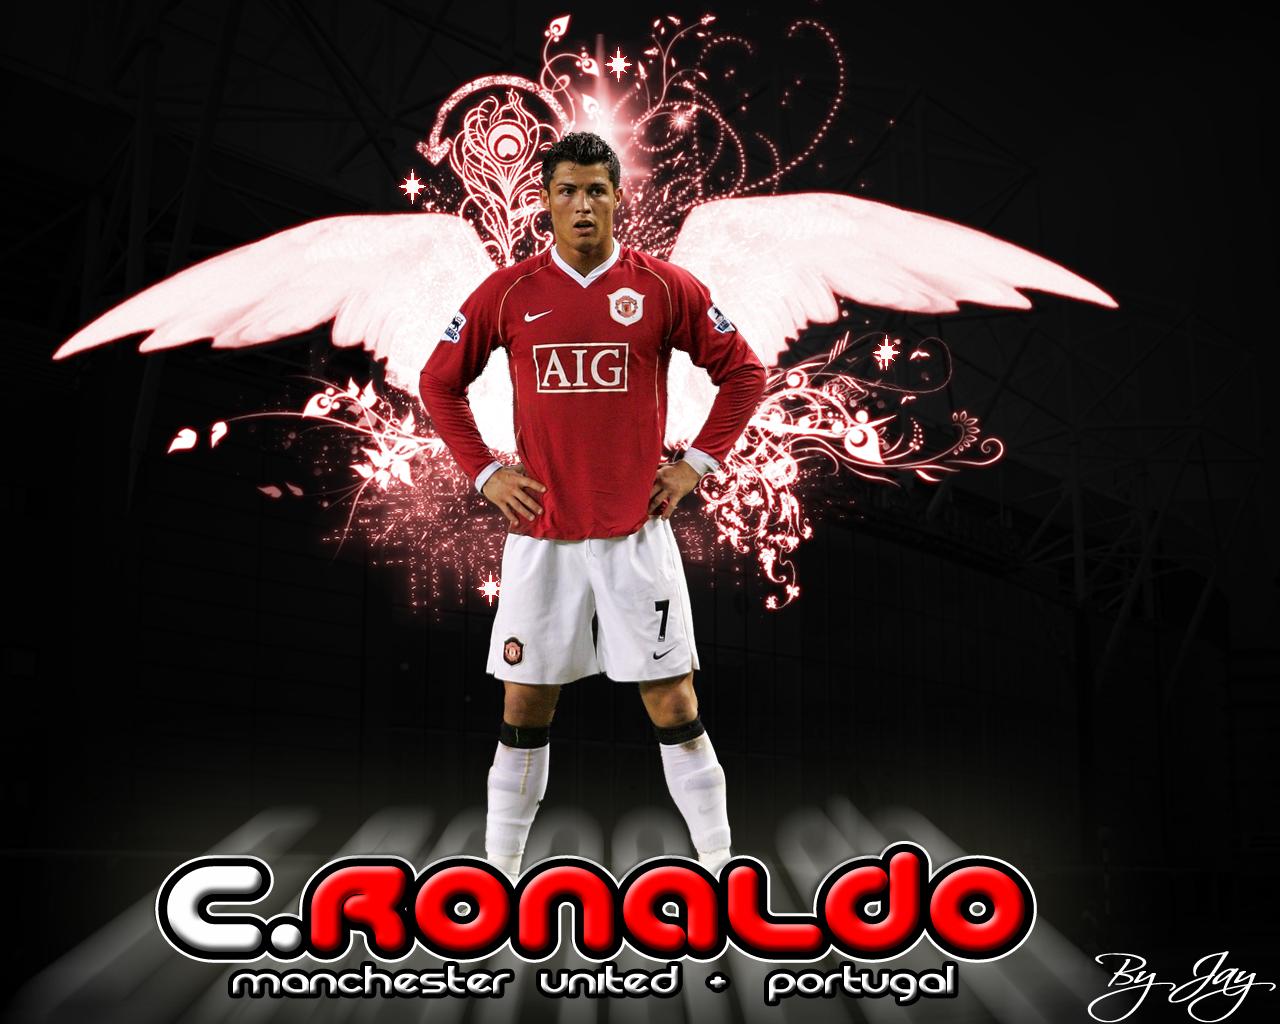 http://1.bp.blogspot.com/-4u_U9Zcssrc/TxbdF_xRYYI/AAAAAAAADd8/Sz39bqAZlUo/s1600/cristiano-ronaldo-footballma-united-wallpaper.jpg